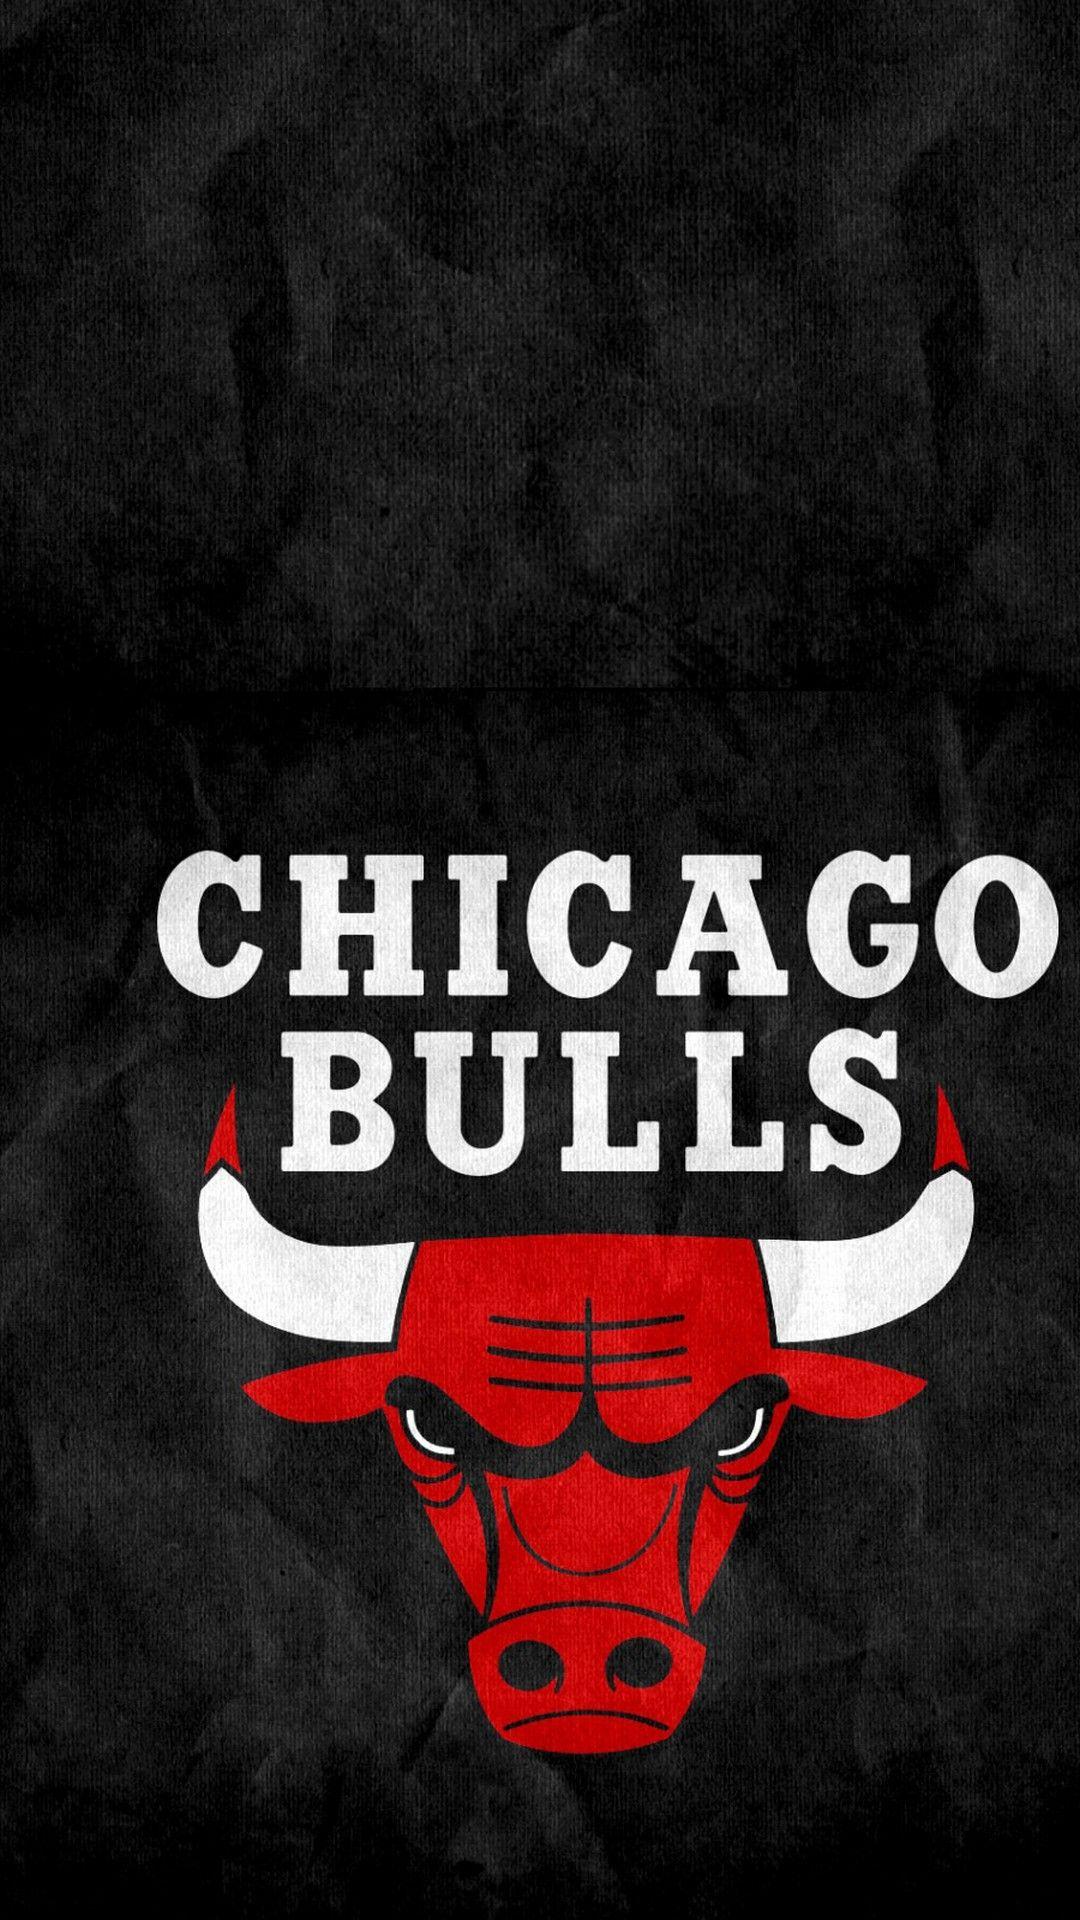 Chicago Bulls Iphone 7 Plus Wallpaper 2021 Basketball Wallpaper Iphone 7 Plus Wallpaper Chicago Bulls 7 Plus Wallpaper